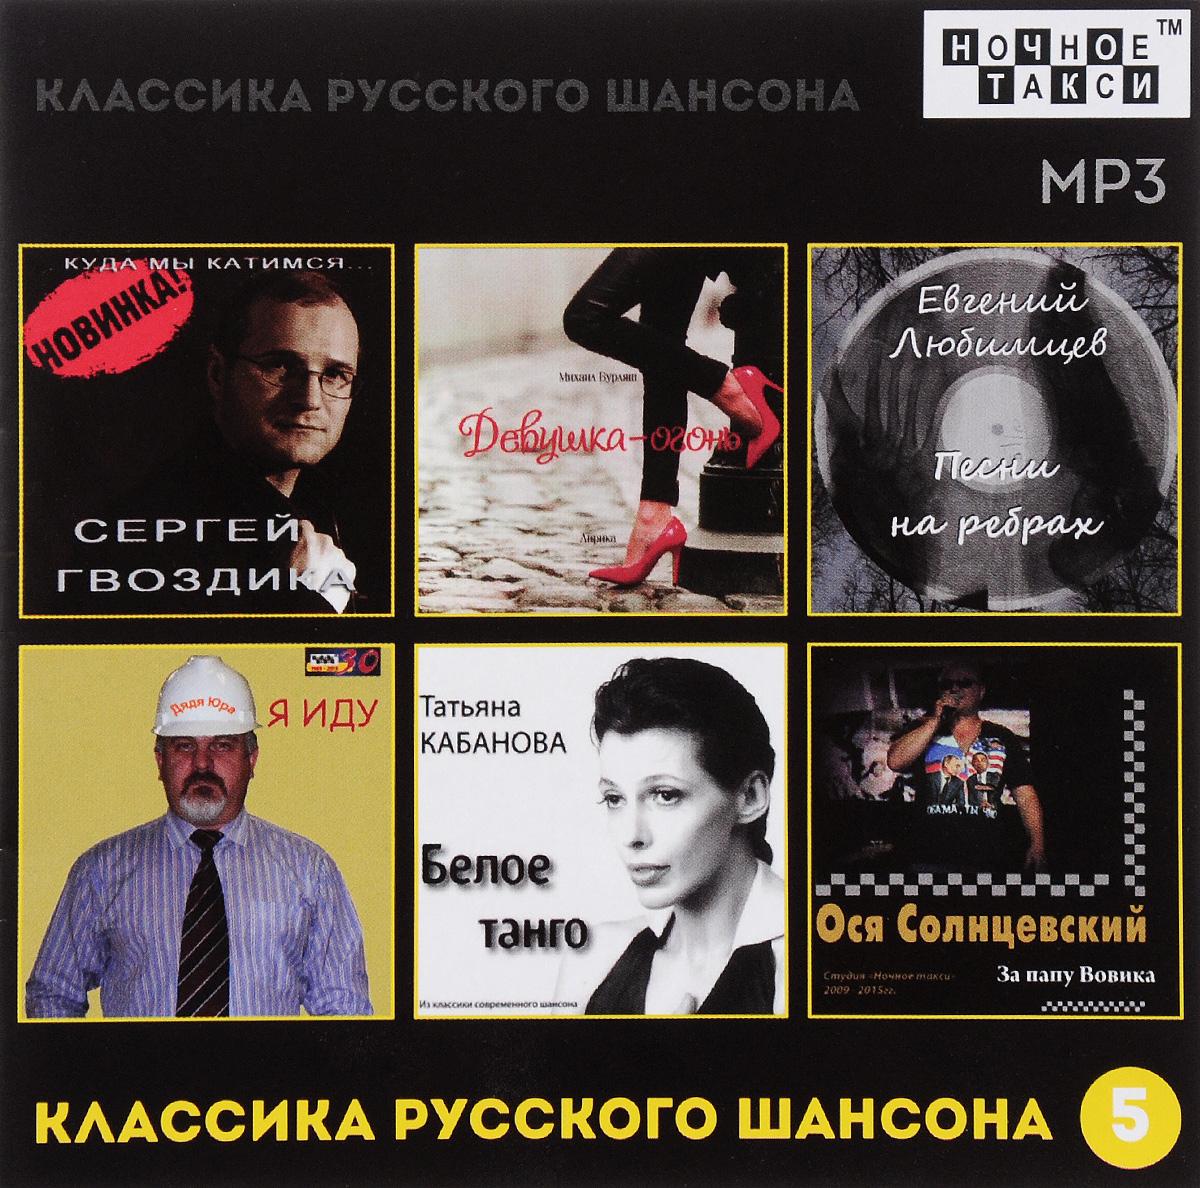 Zakazat.ru Классика русского шансона 5 (mp3)